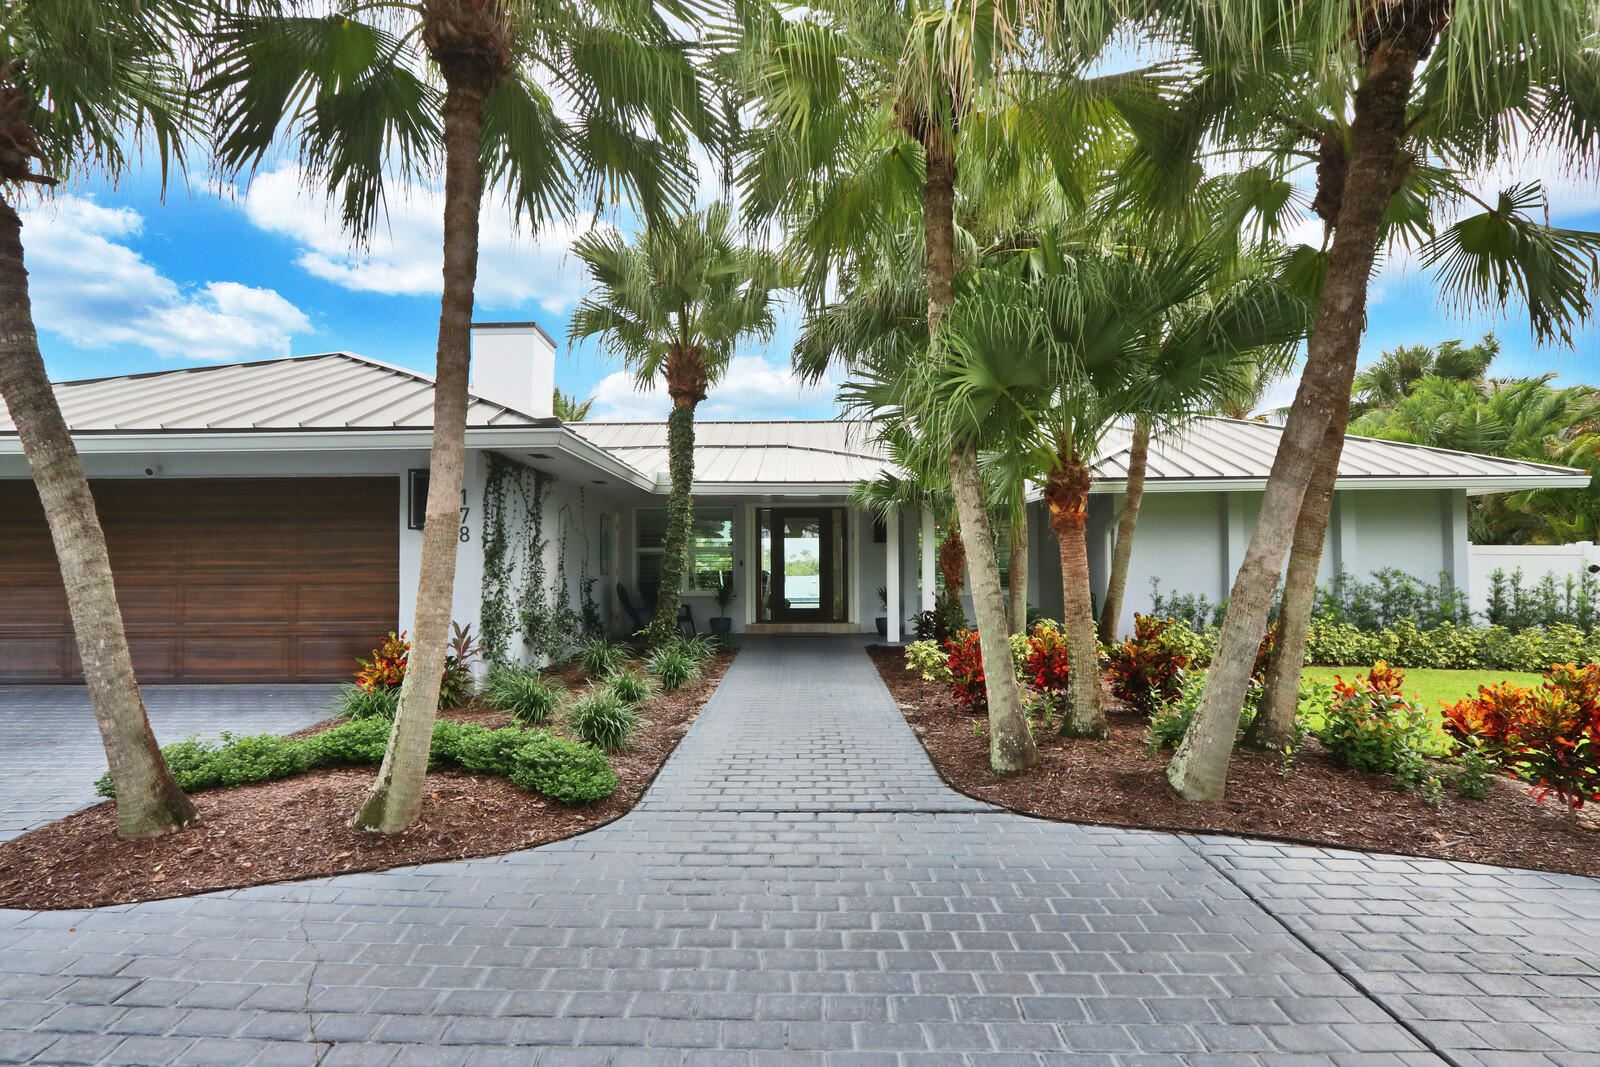 178 Country Club Drive, Tequesta, FL 33469 - #: RX-10658596